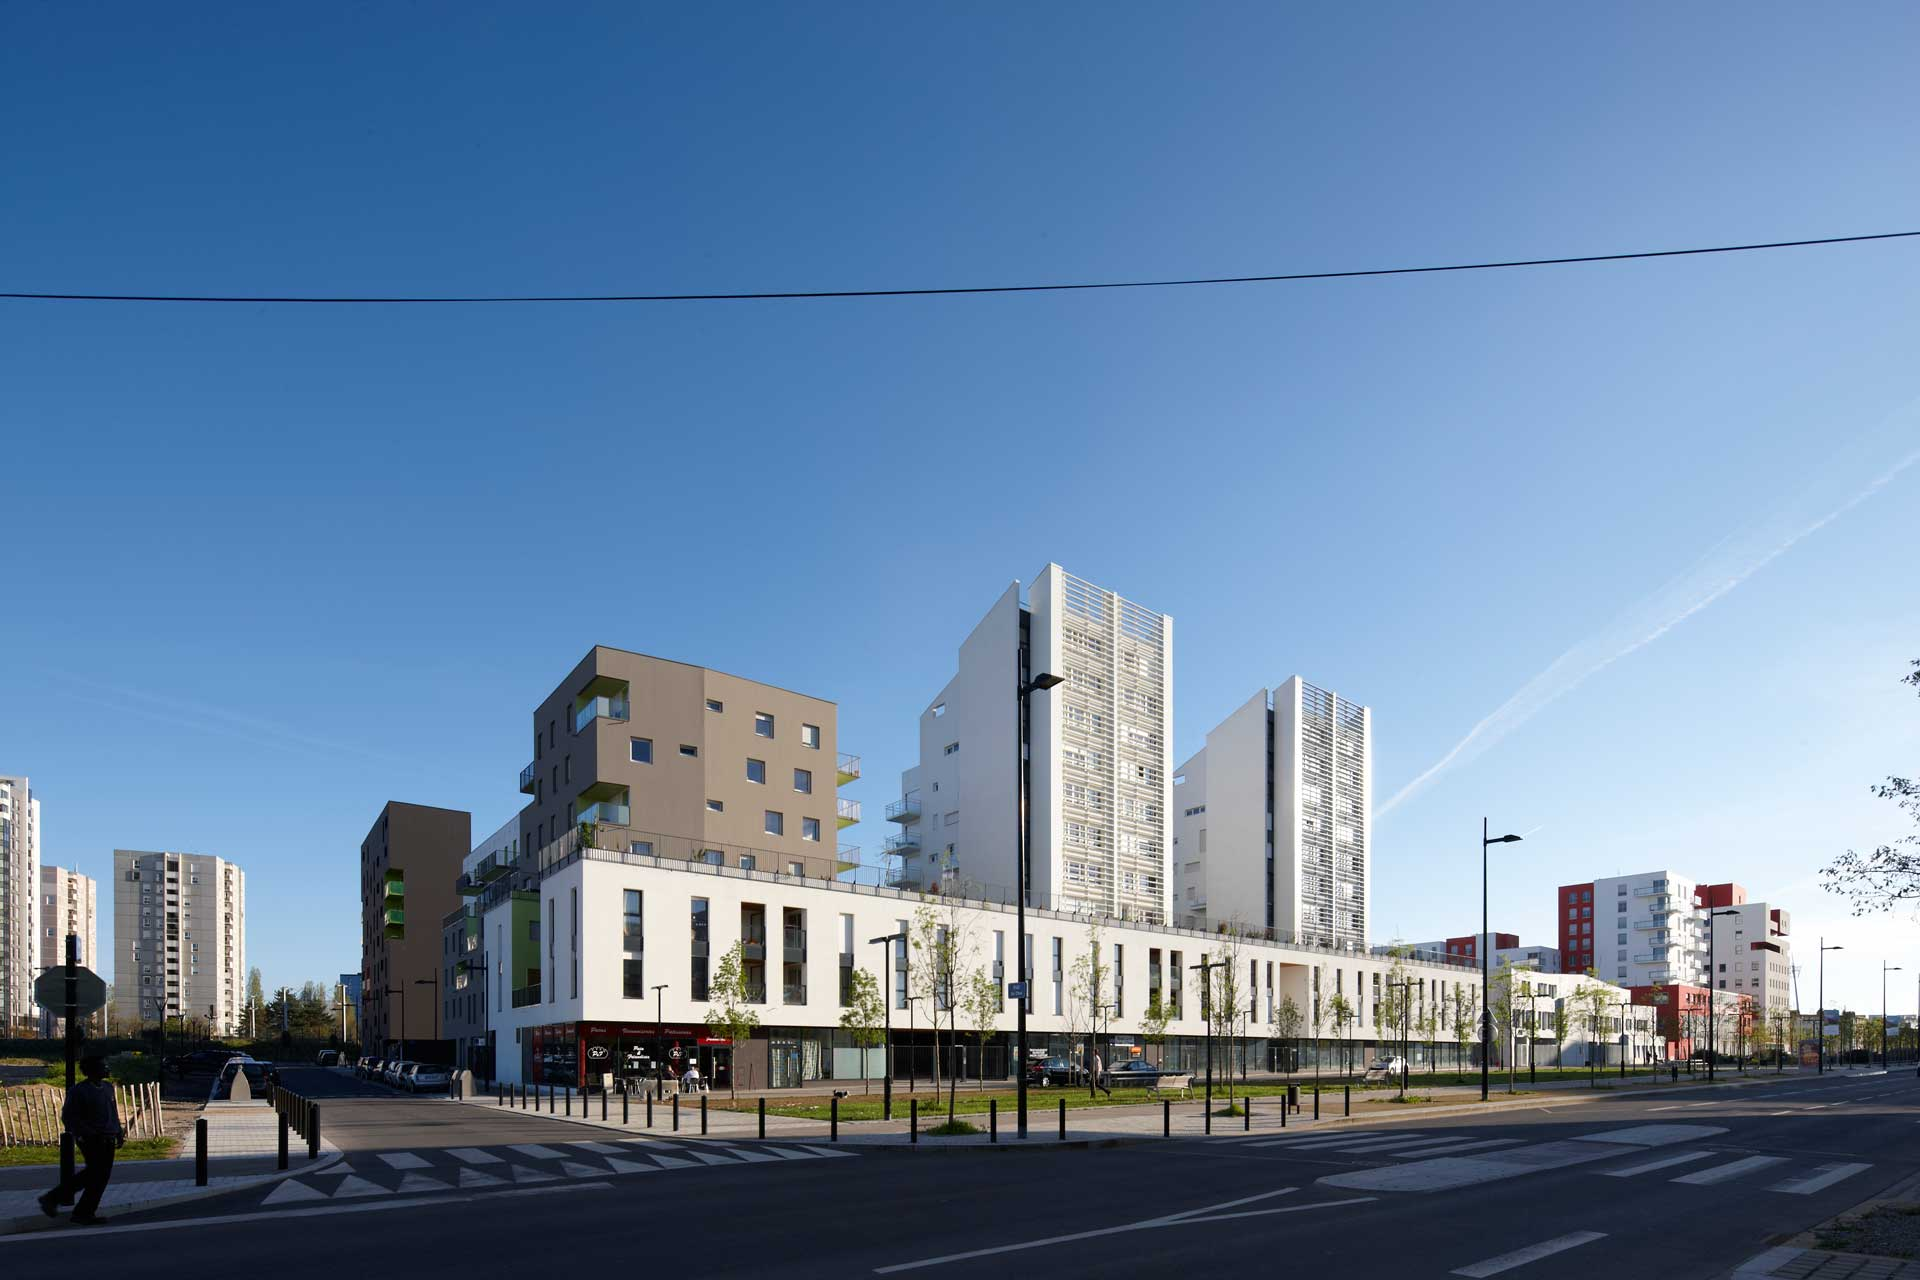 Aaupc patrick chavannes kanop for Agence urbanisme paysage nantes